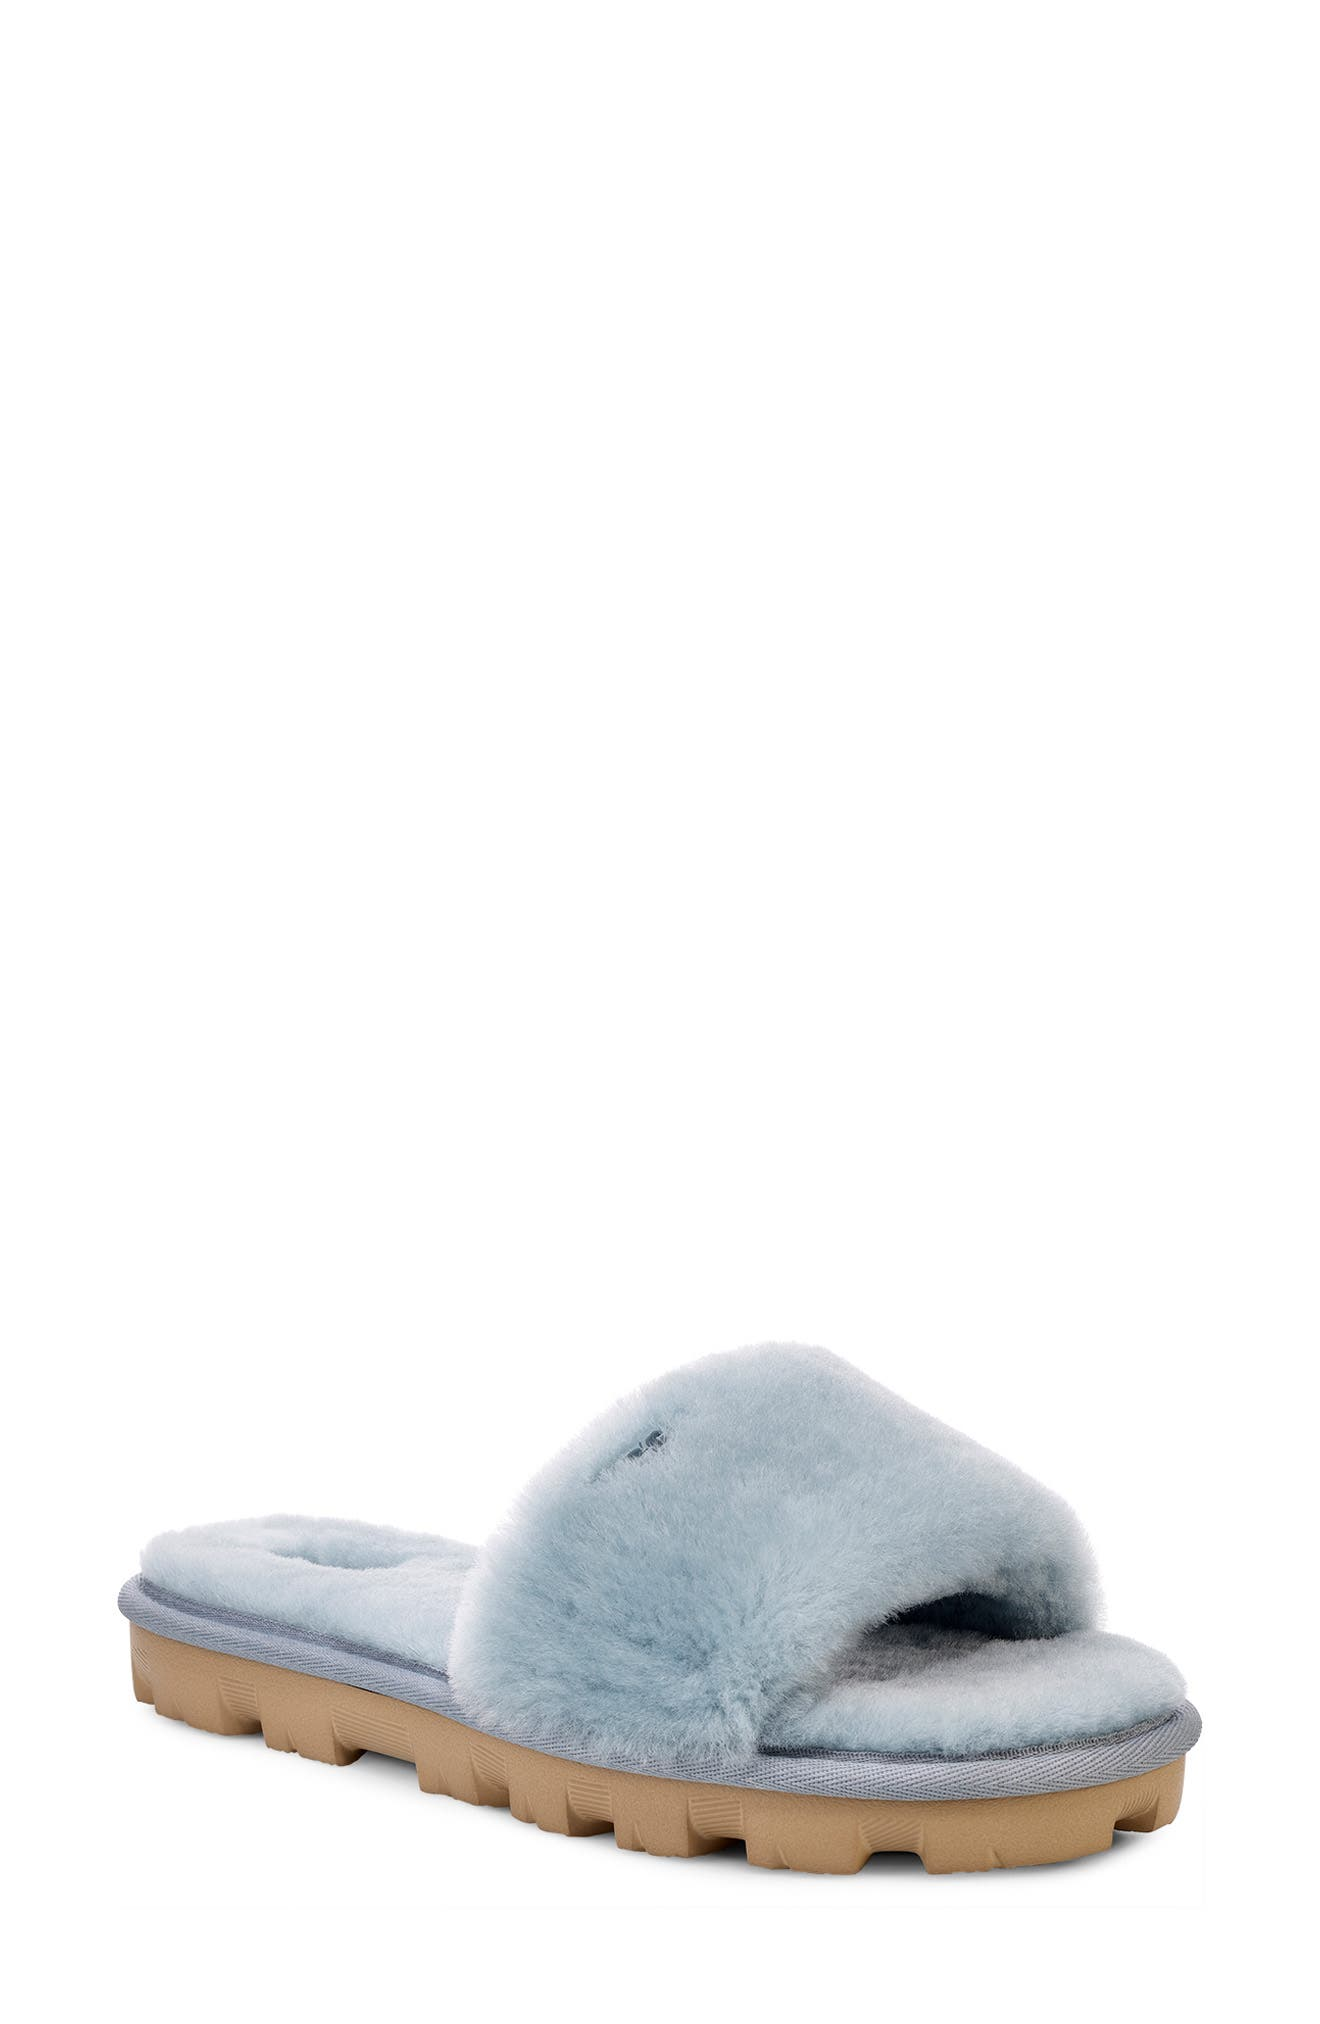 Ugg Cosette Genuine Shearling Slipper, Blue